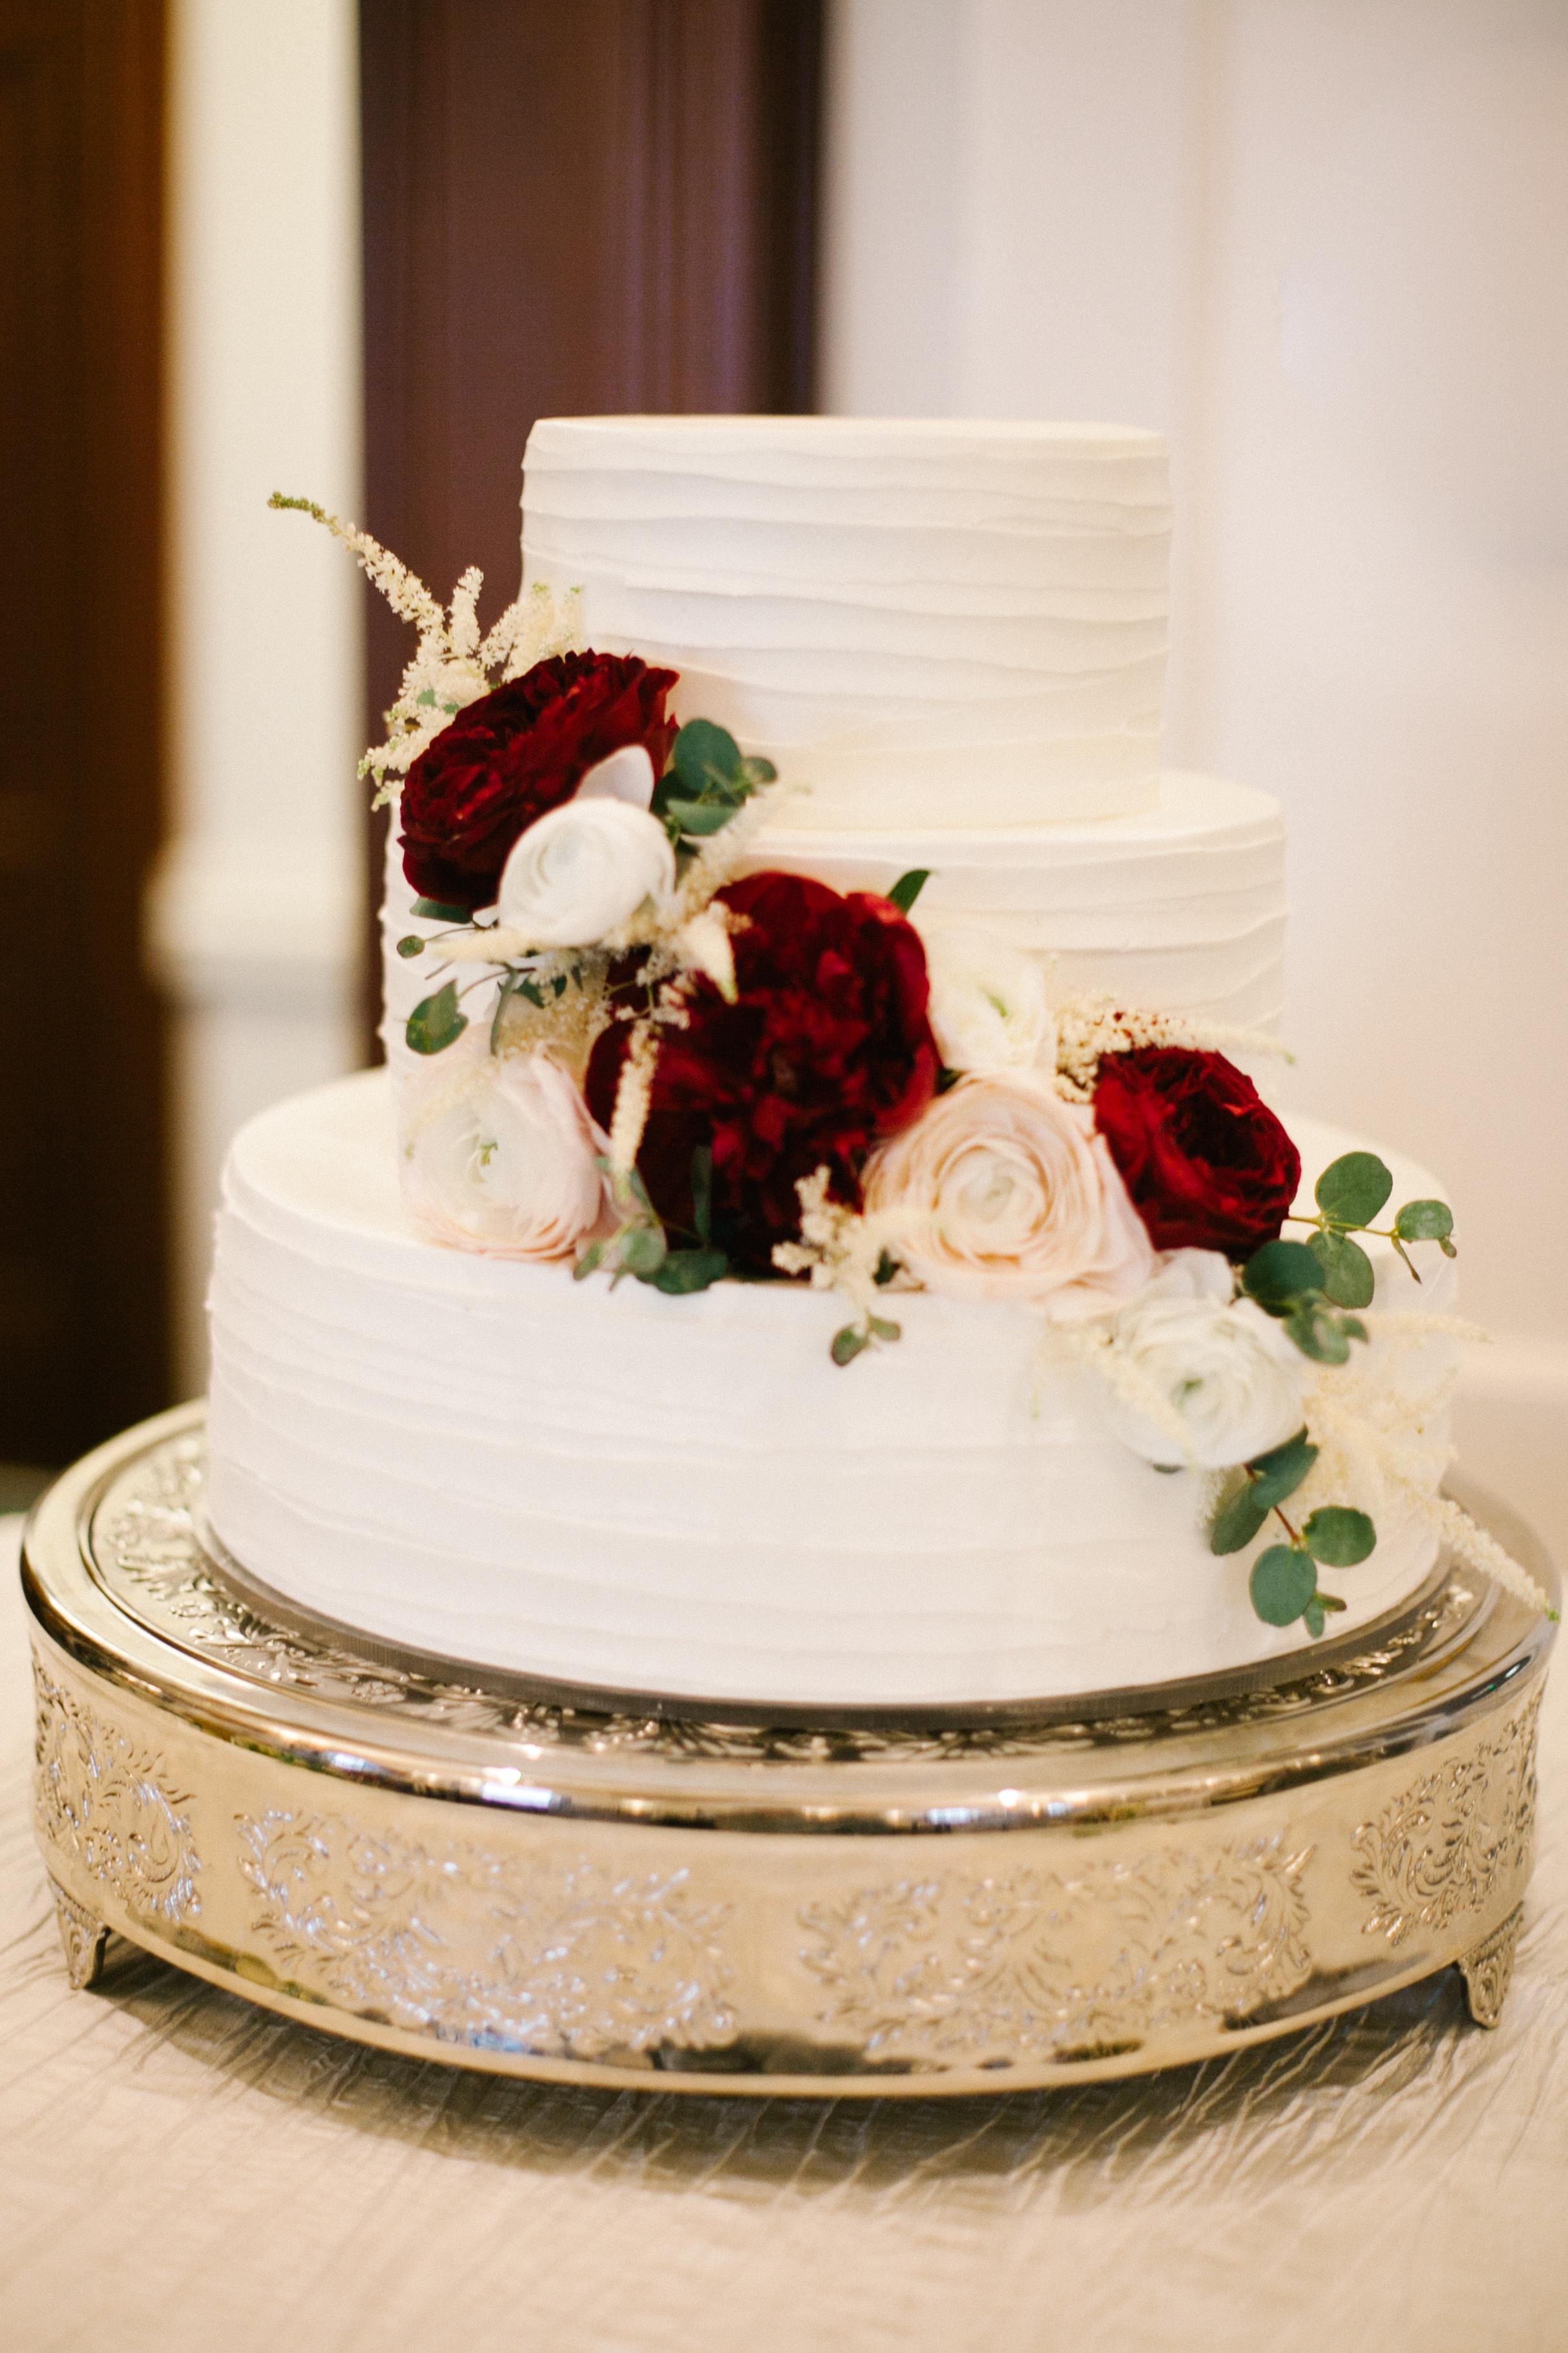 Wedding Cakes Chattanooga Tn  Chattanooga Wedding Cakes